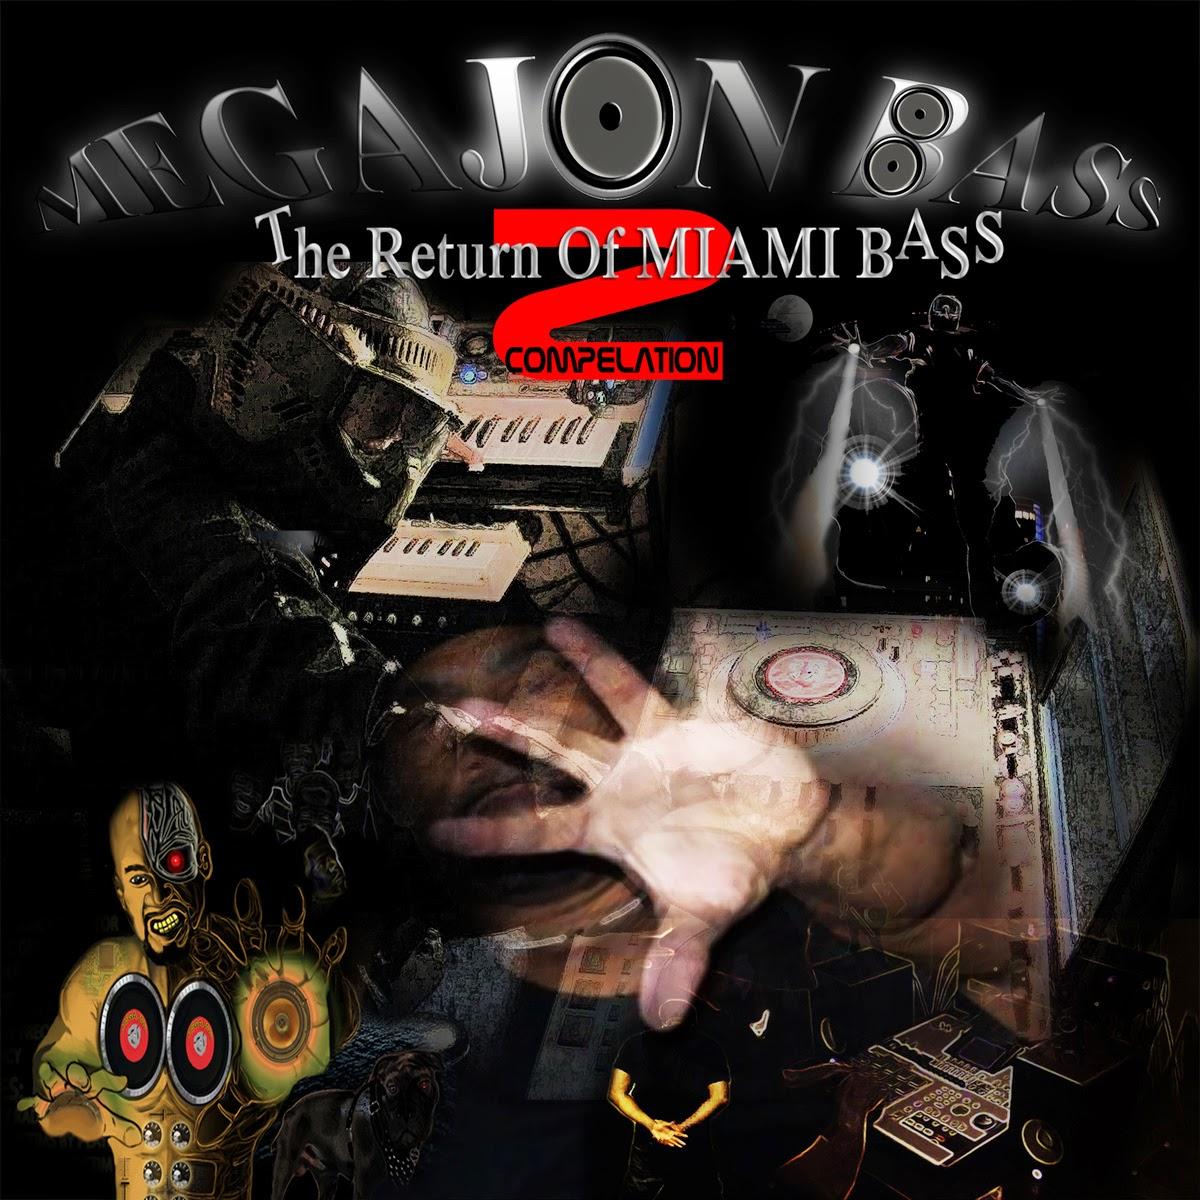 Megajon Bass - The Return Of Miami Bass 2 Compelation (2014)